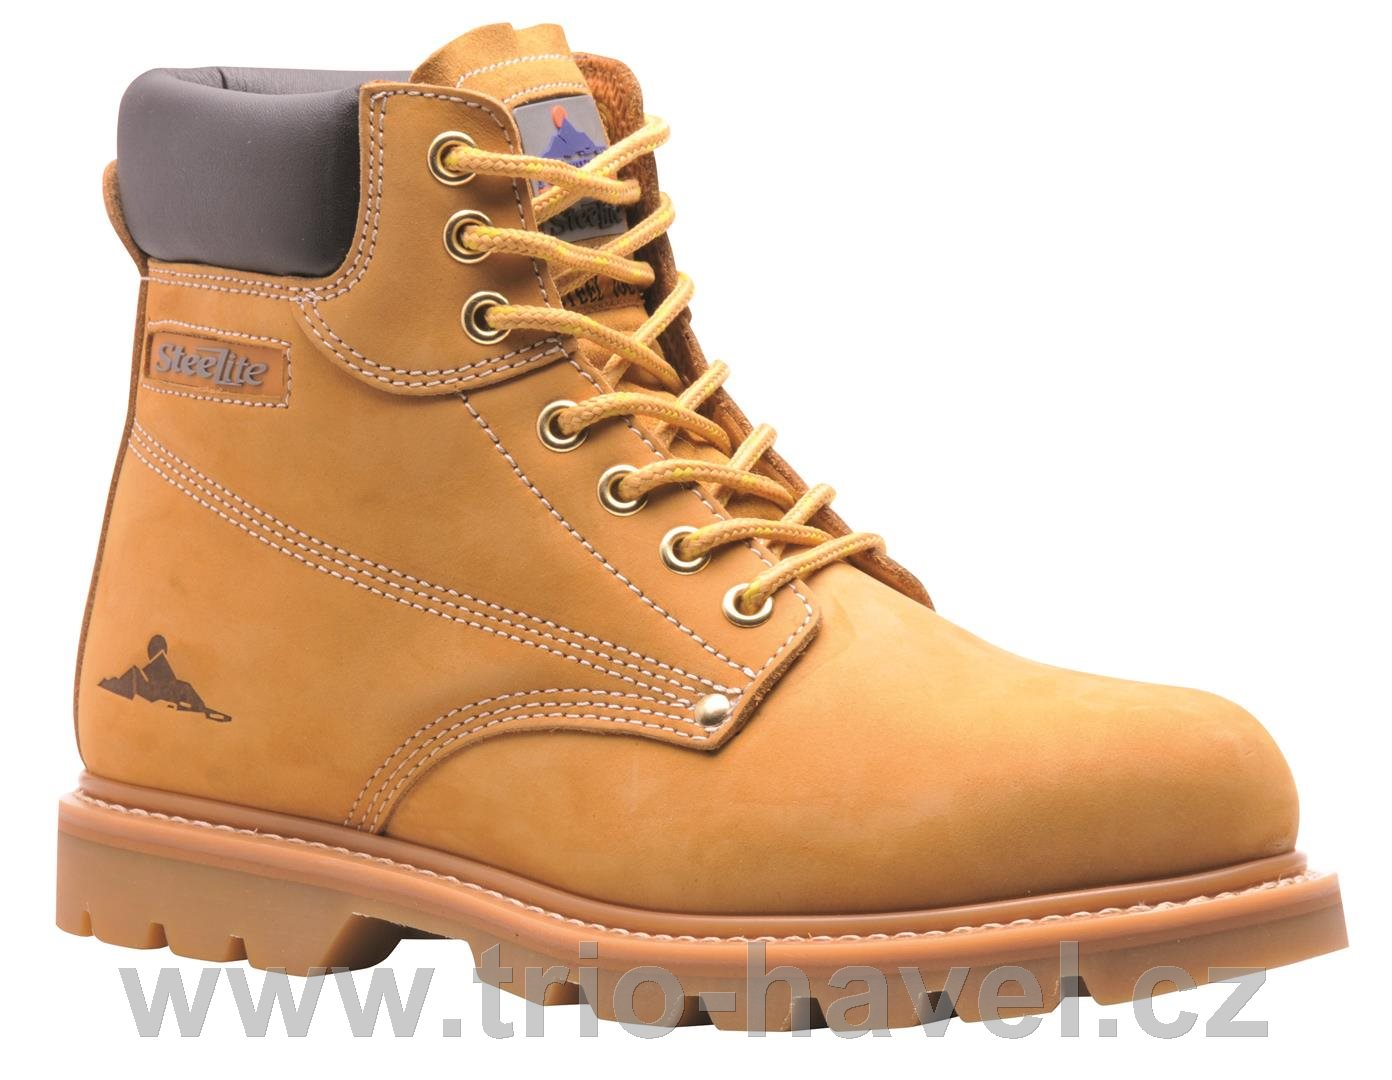 b2d74c4995fb Kotníková obuv Farmer SB